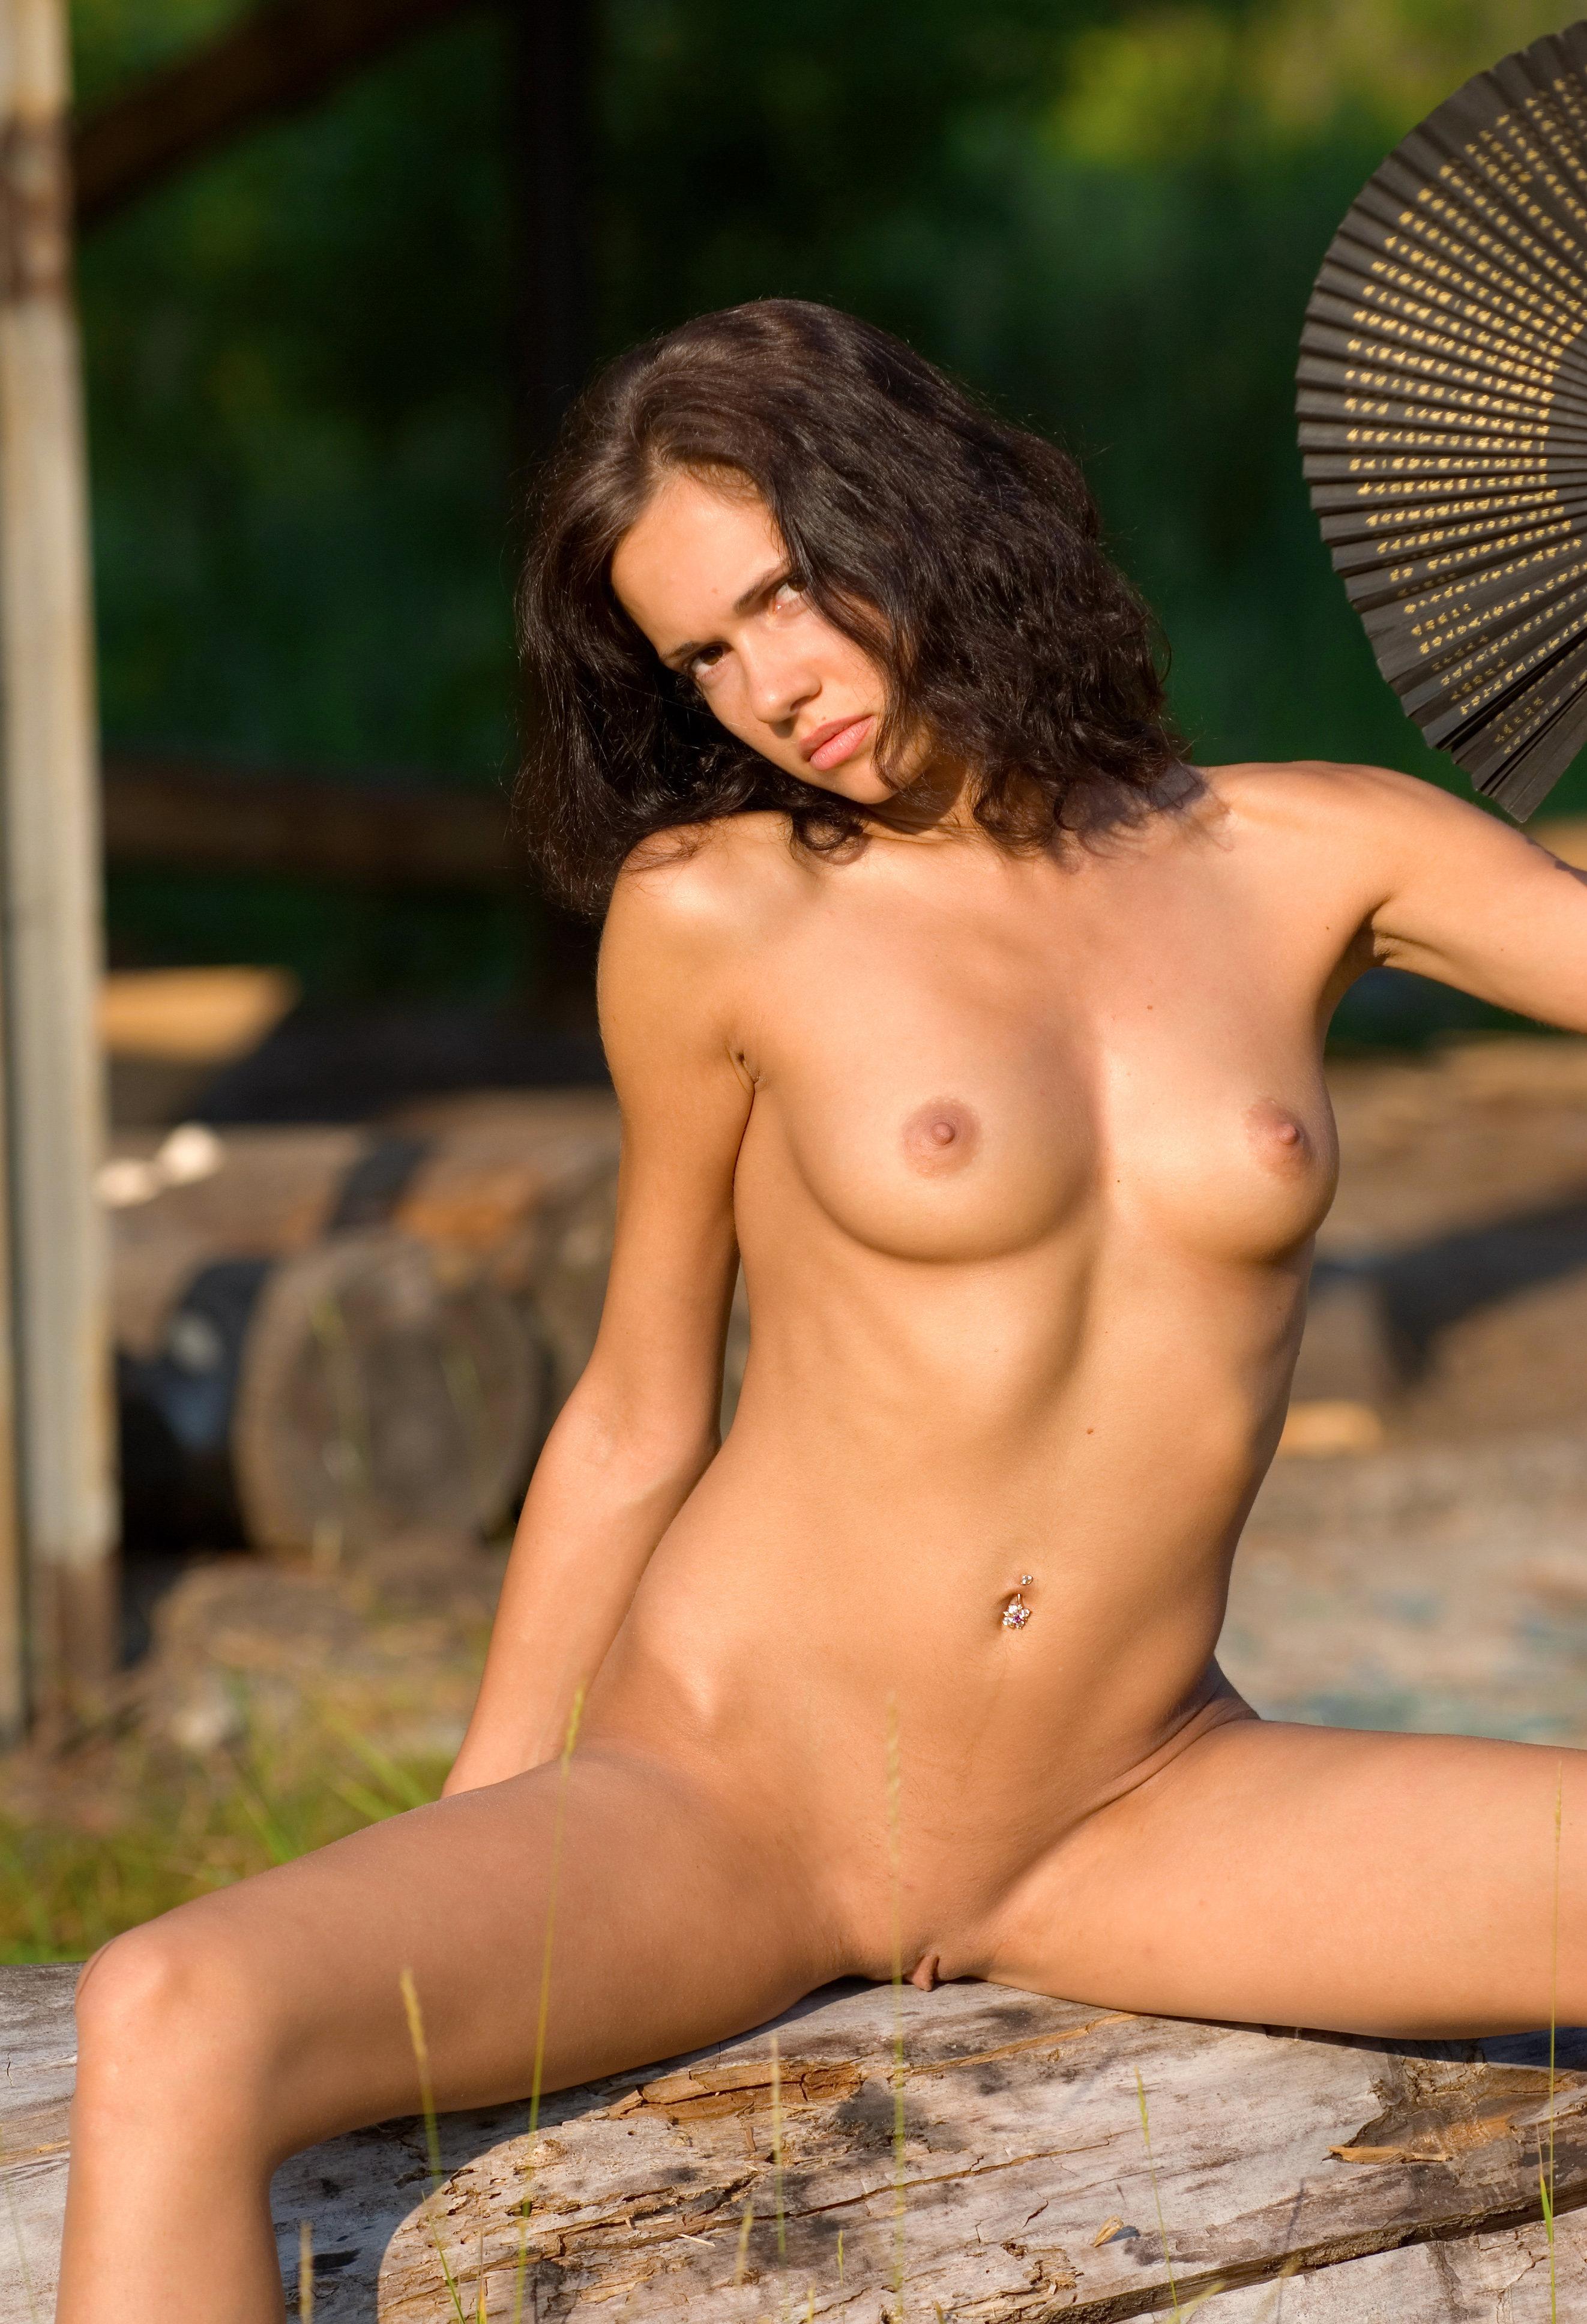 Nud fania porn gallery